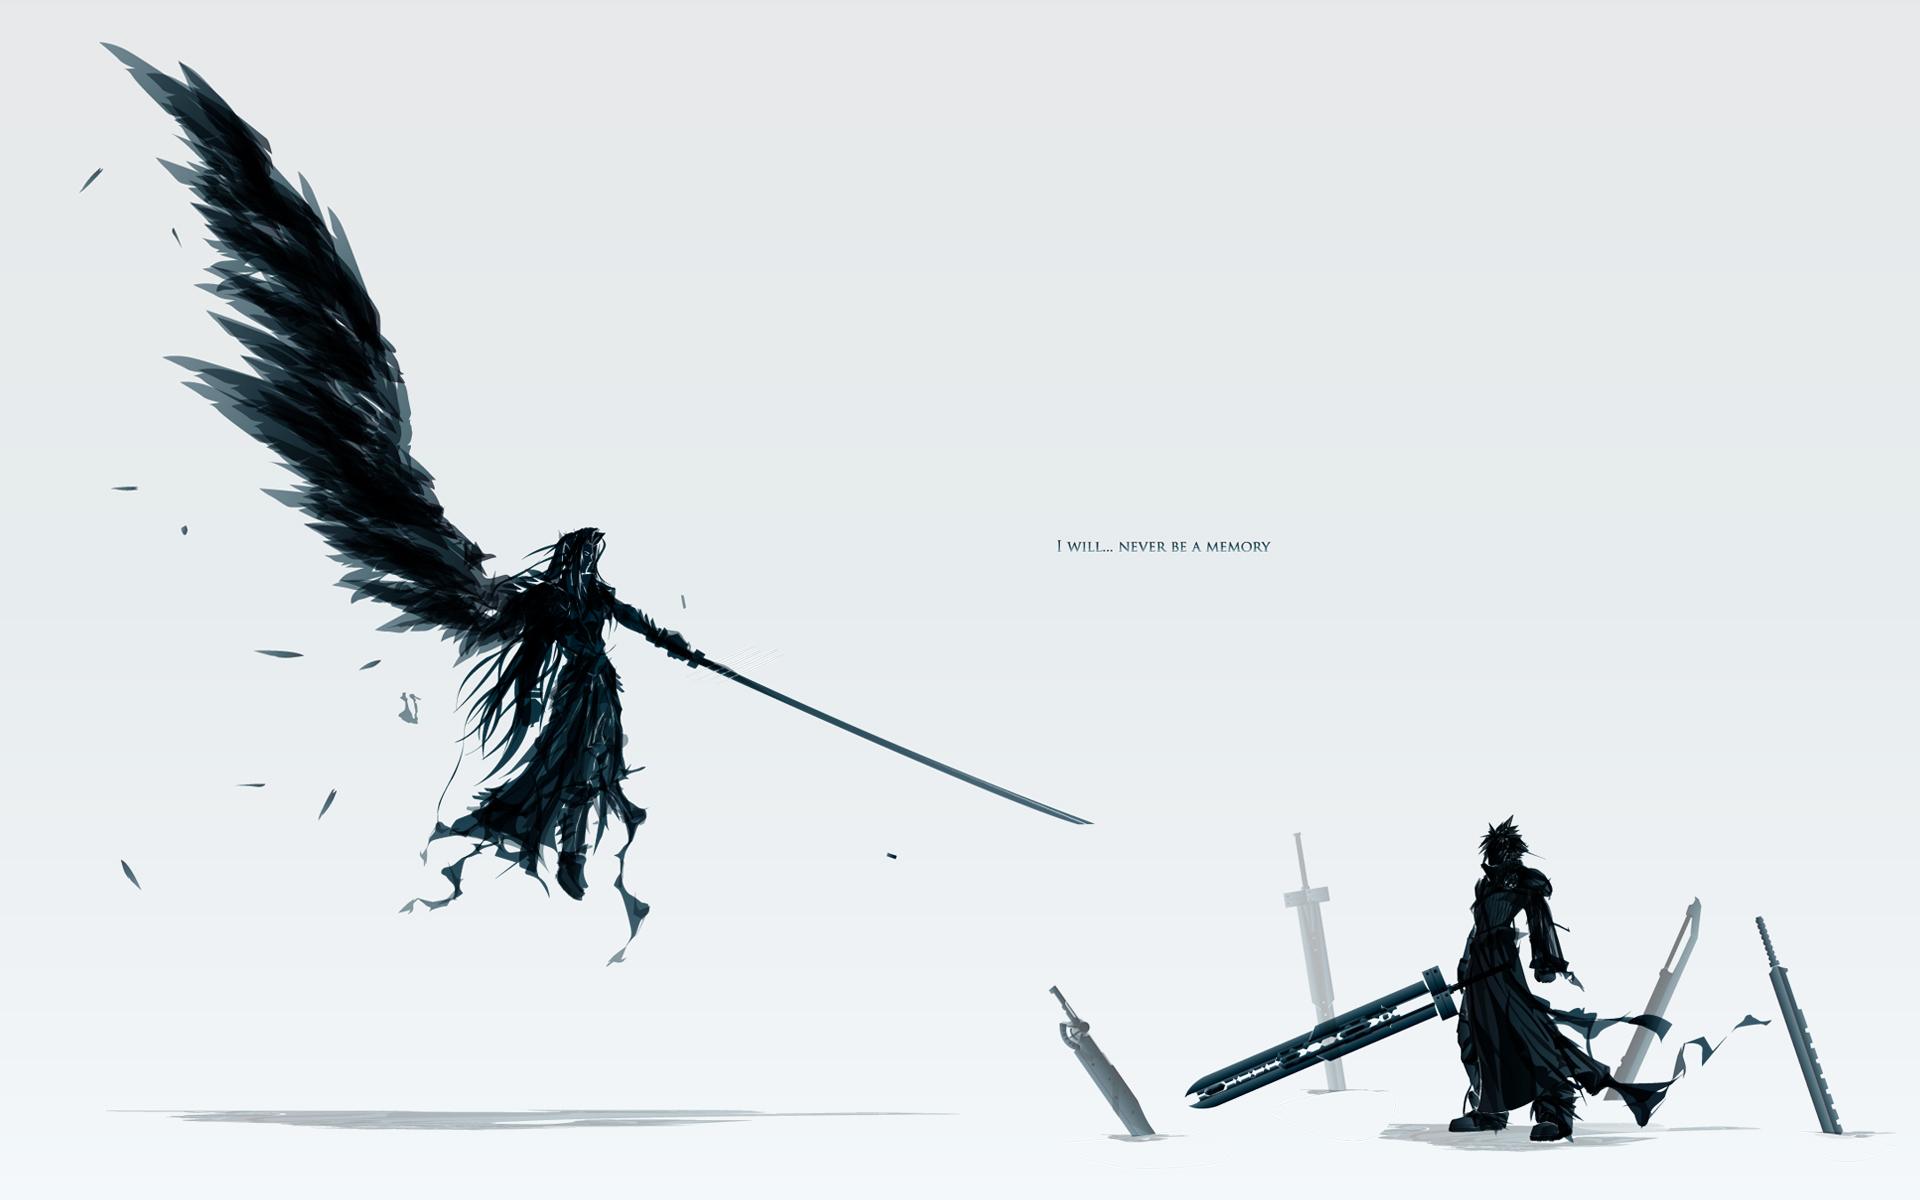 final fantasy wallpaper wings black